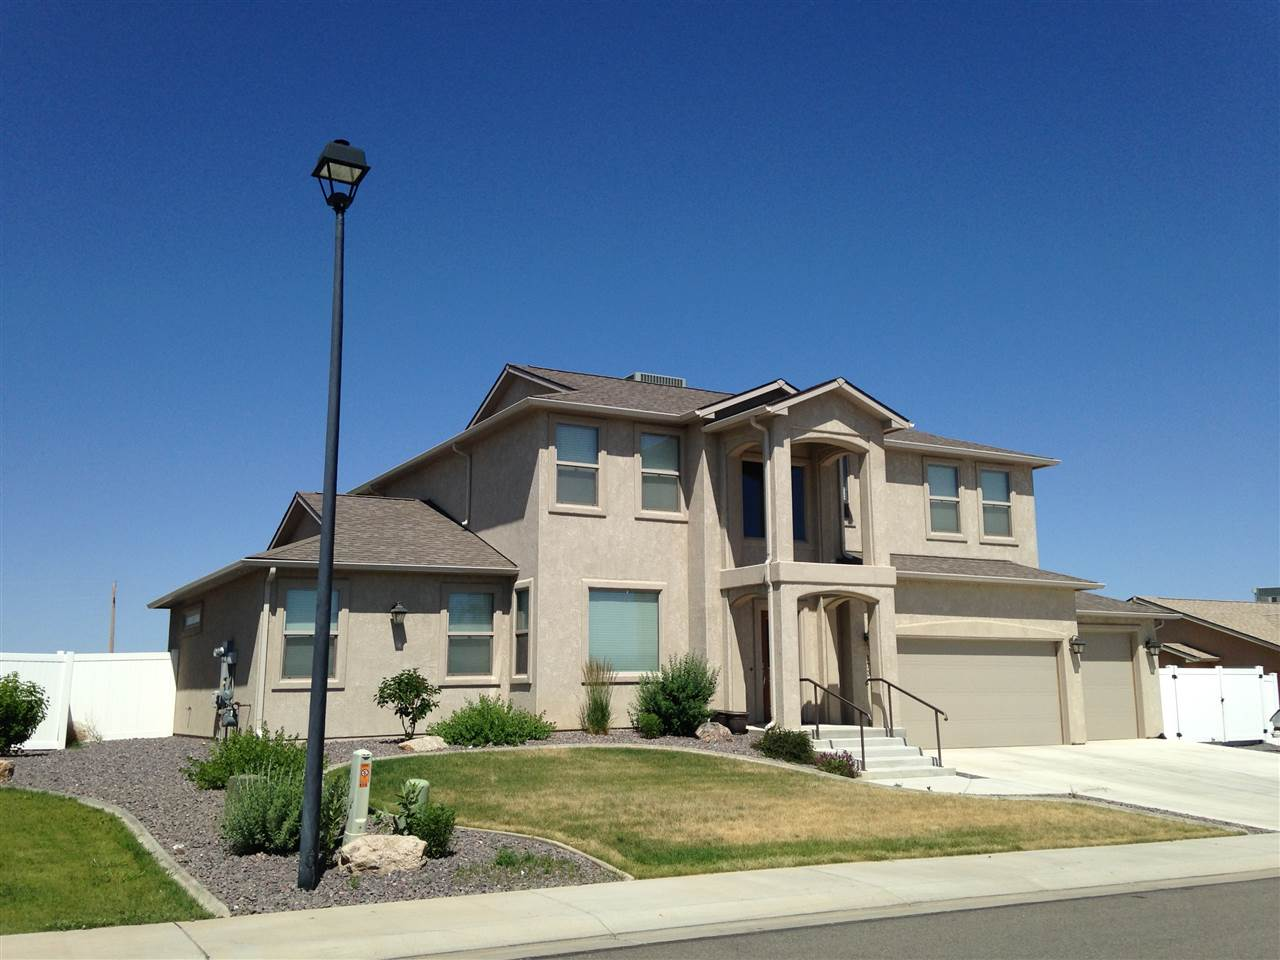 173 Winter Hawk Drive, Grand Junction, CO 81503